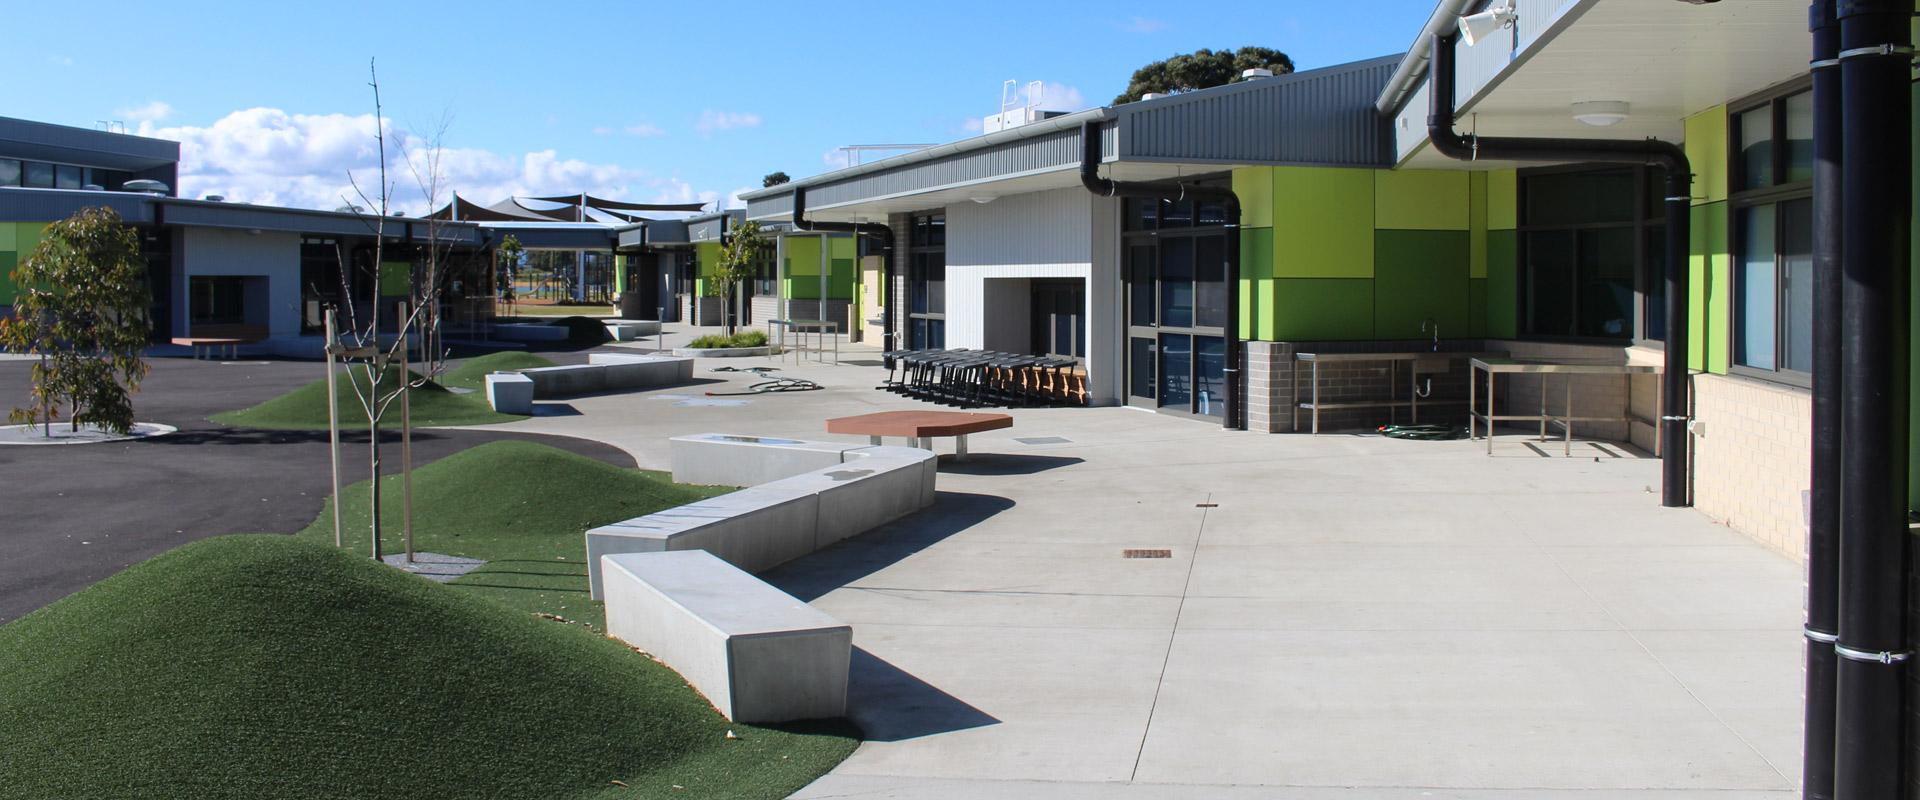 New Schools Public Private Partnership